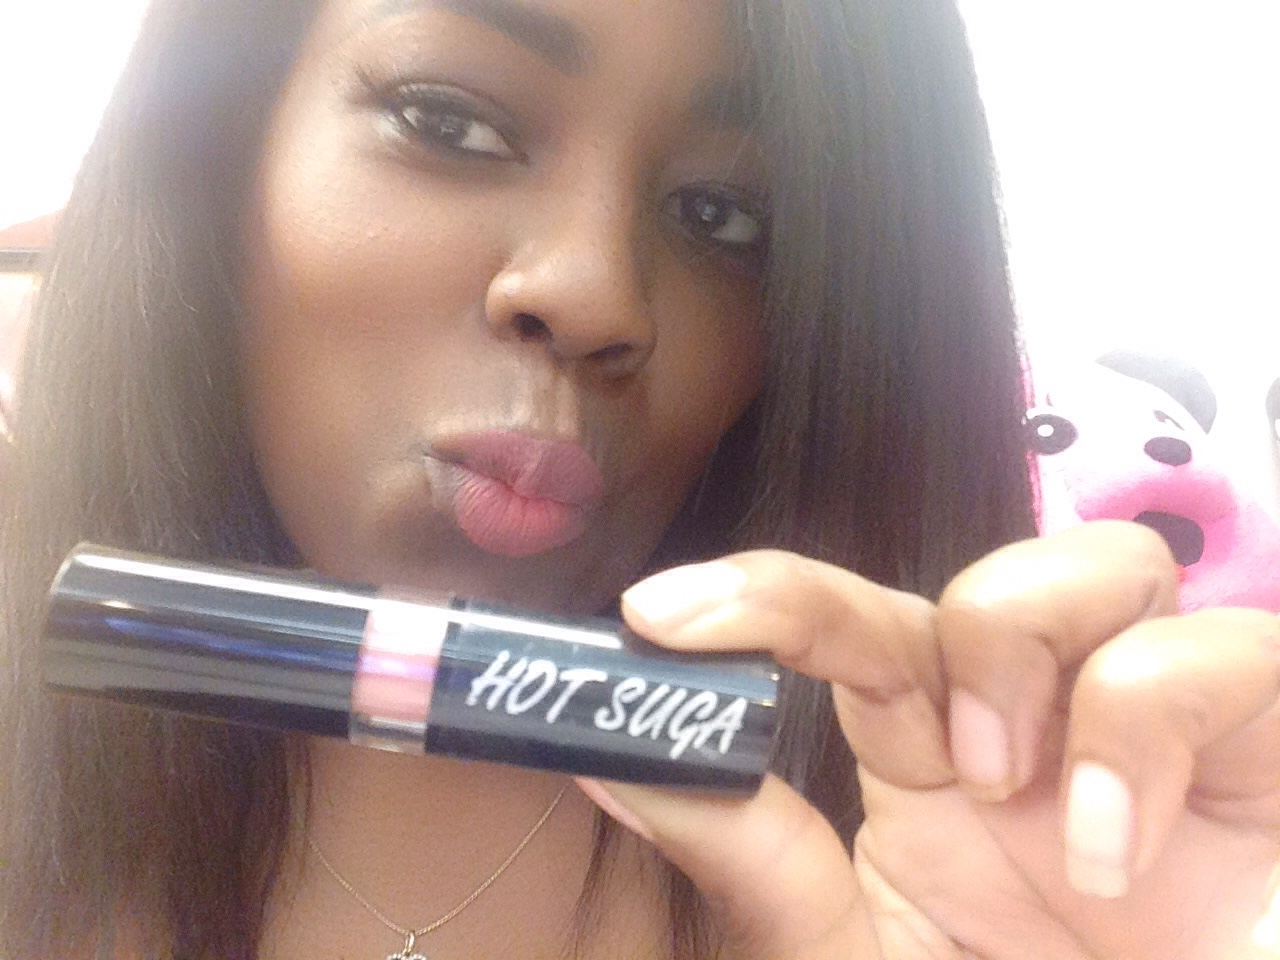 Pinktastic Saturday: Hot Suga Lipstick